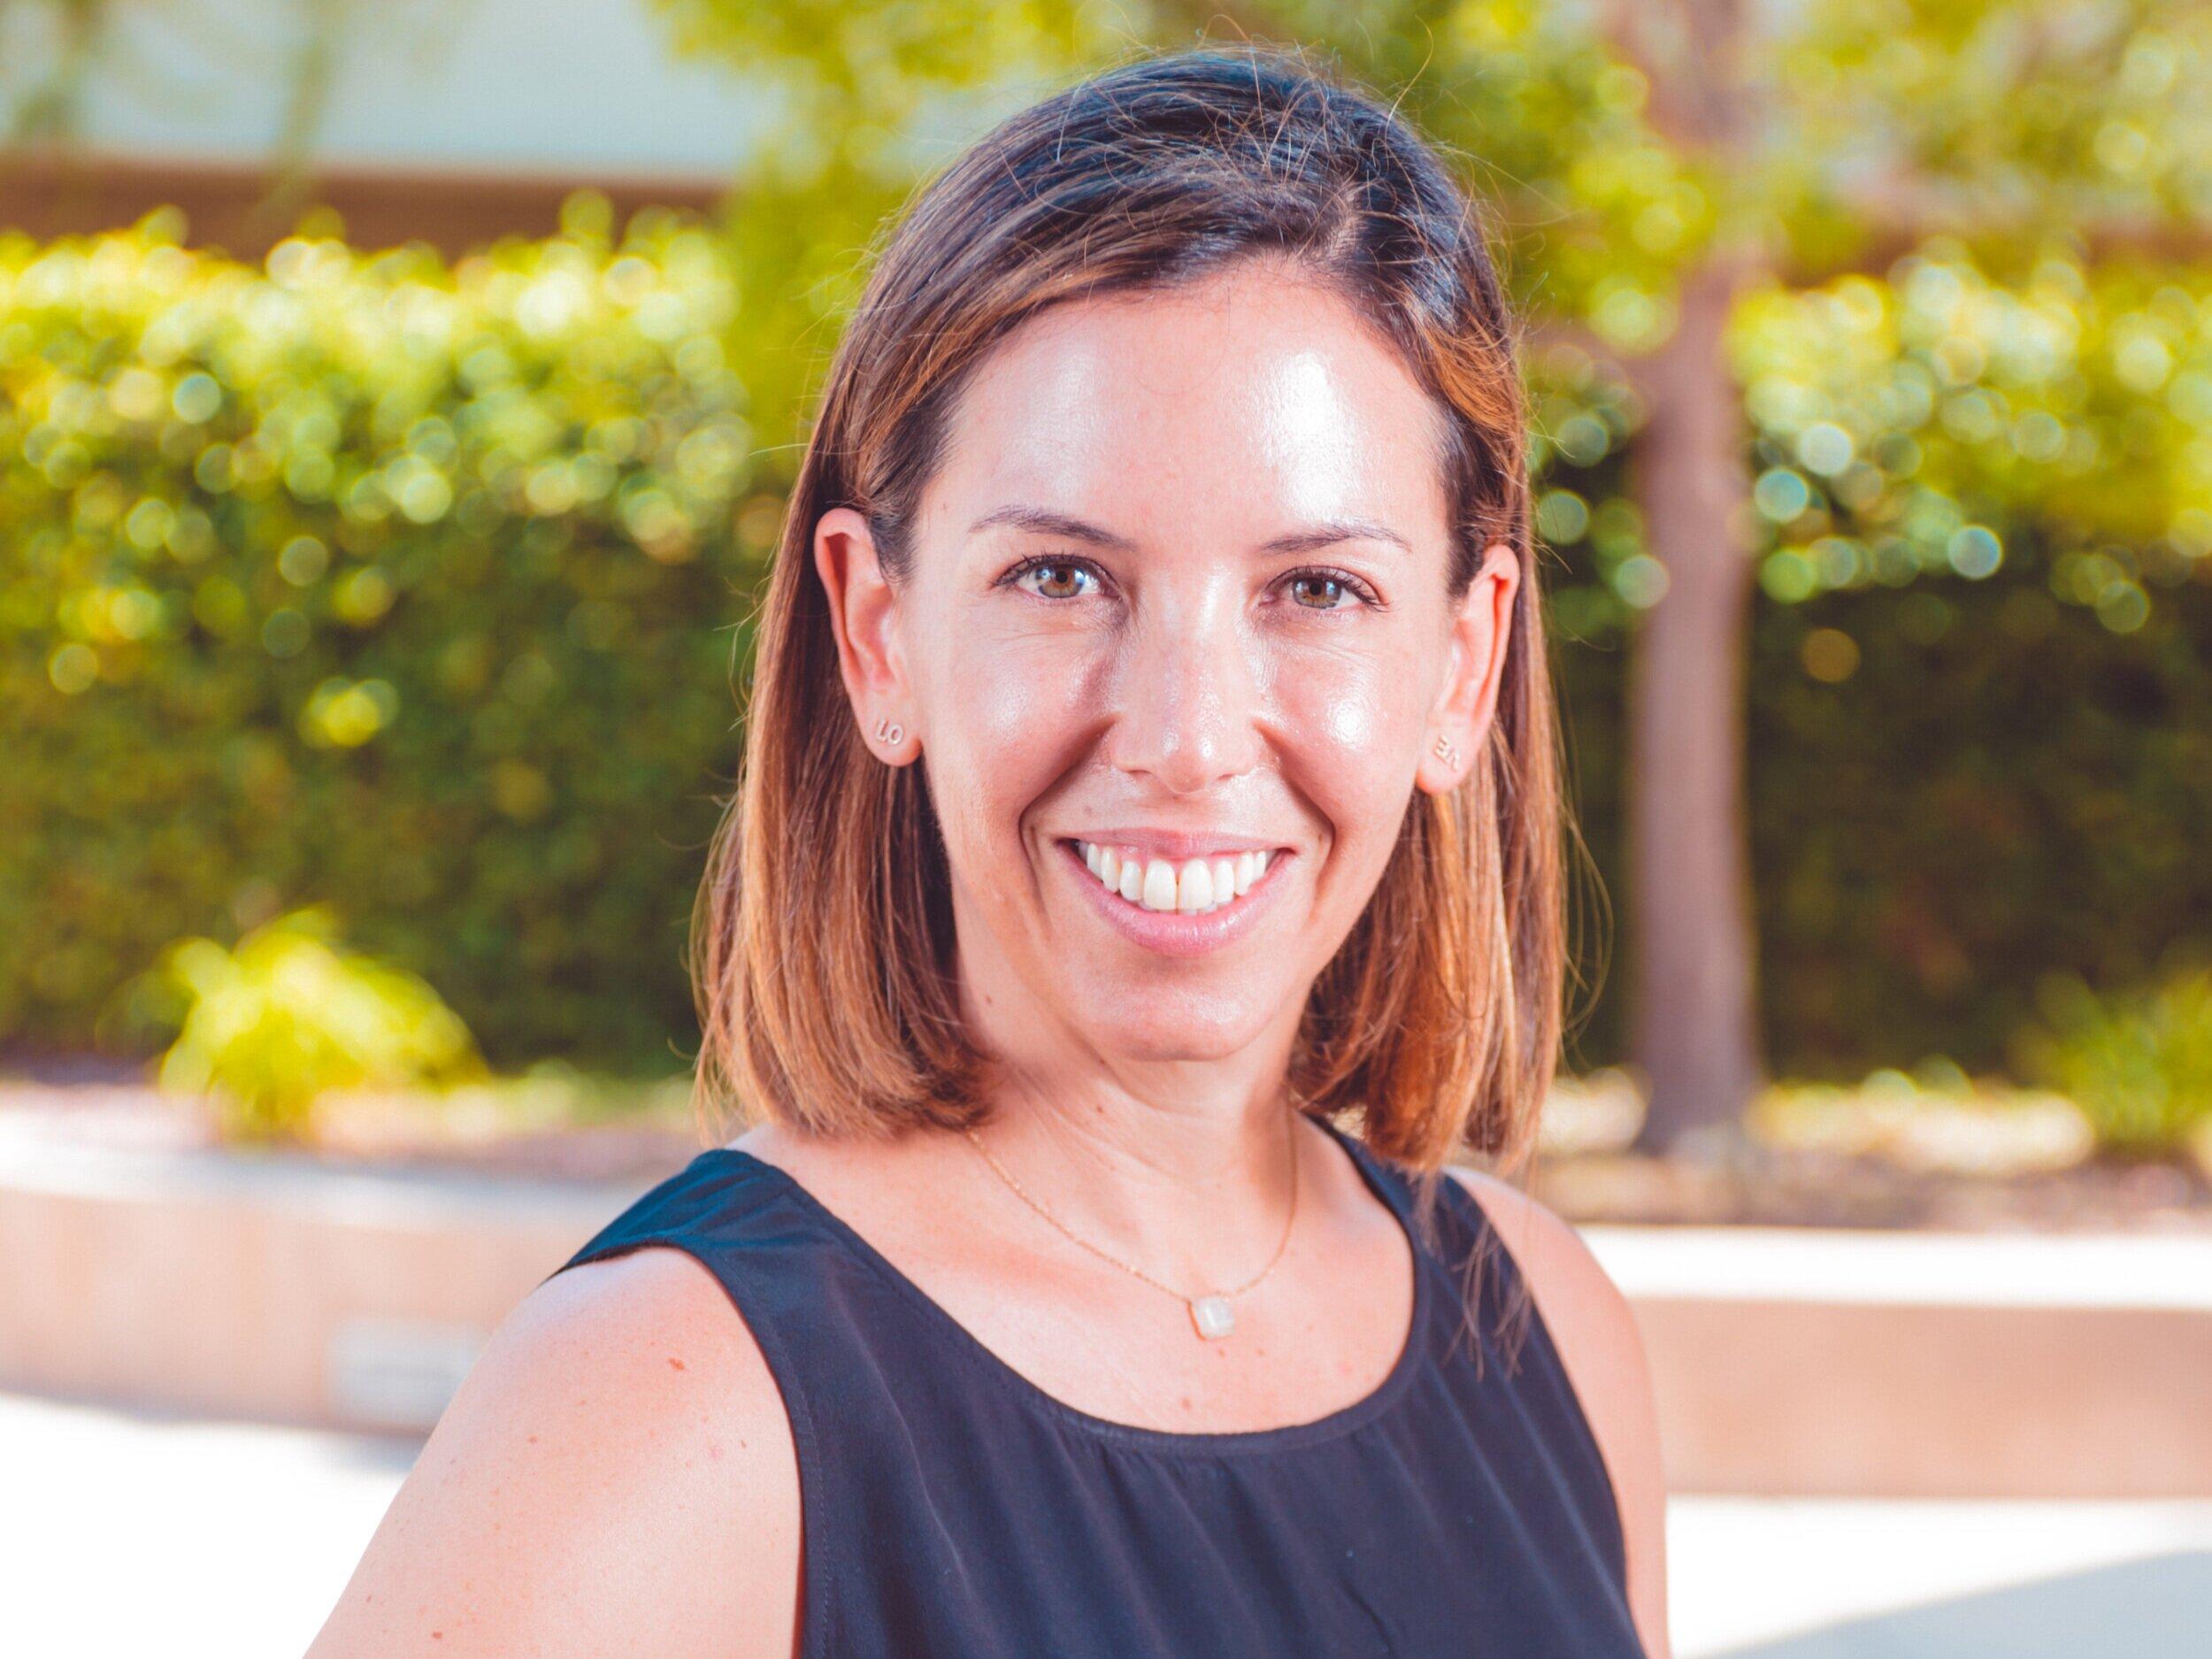 Sonia Mandelbaum SDJA alumna and parent, 索尼娅在SDJA发展委员会任职多年,提供发展和营销专业知识.